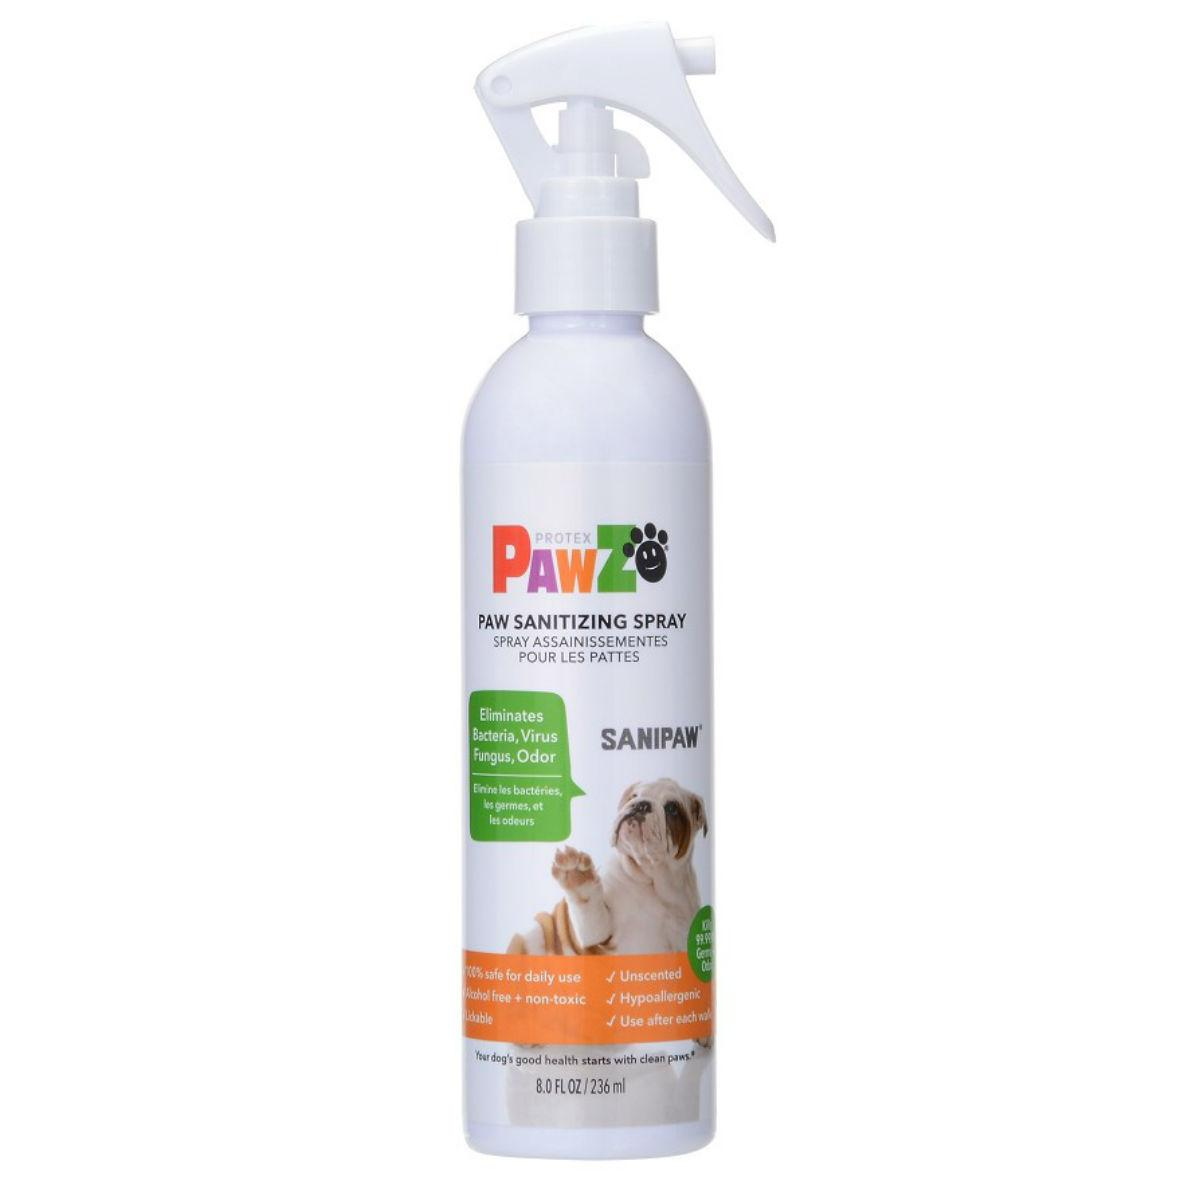 PAWZ Sanipaw Paw Sanitizing Spray Image